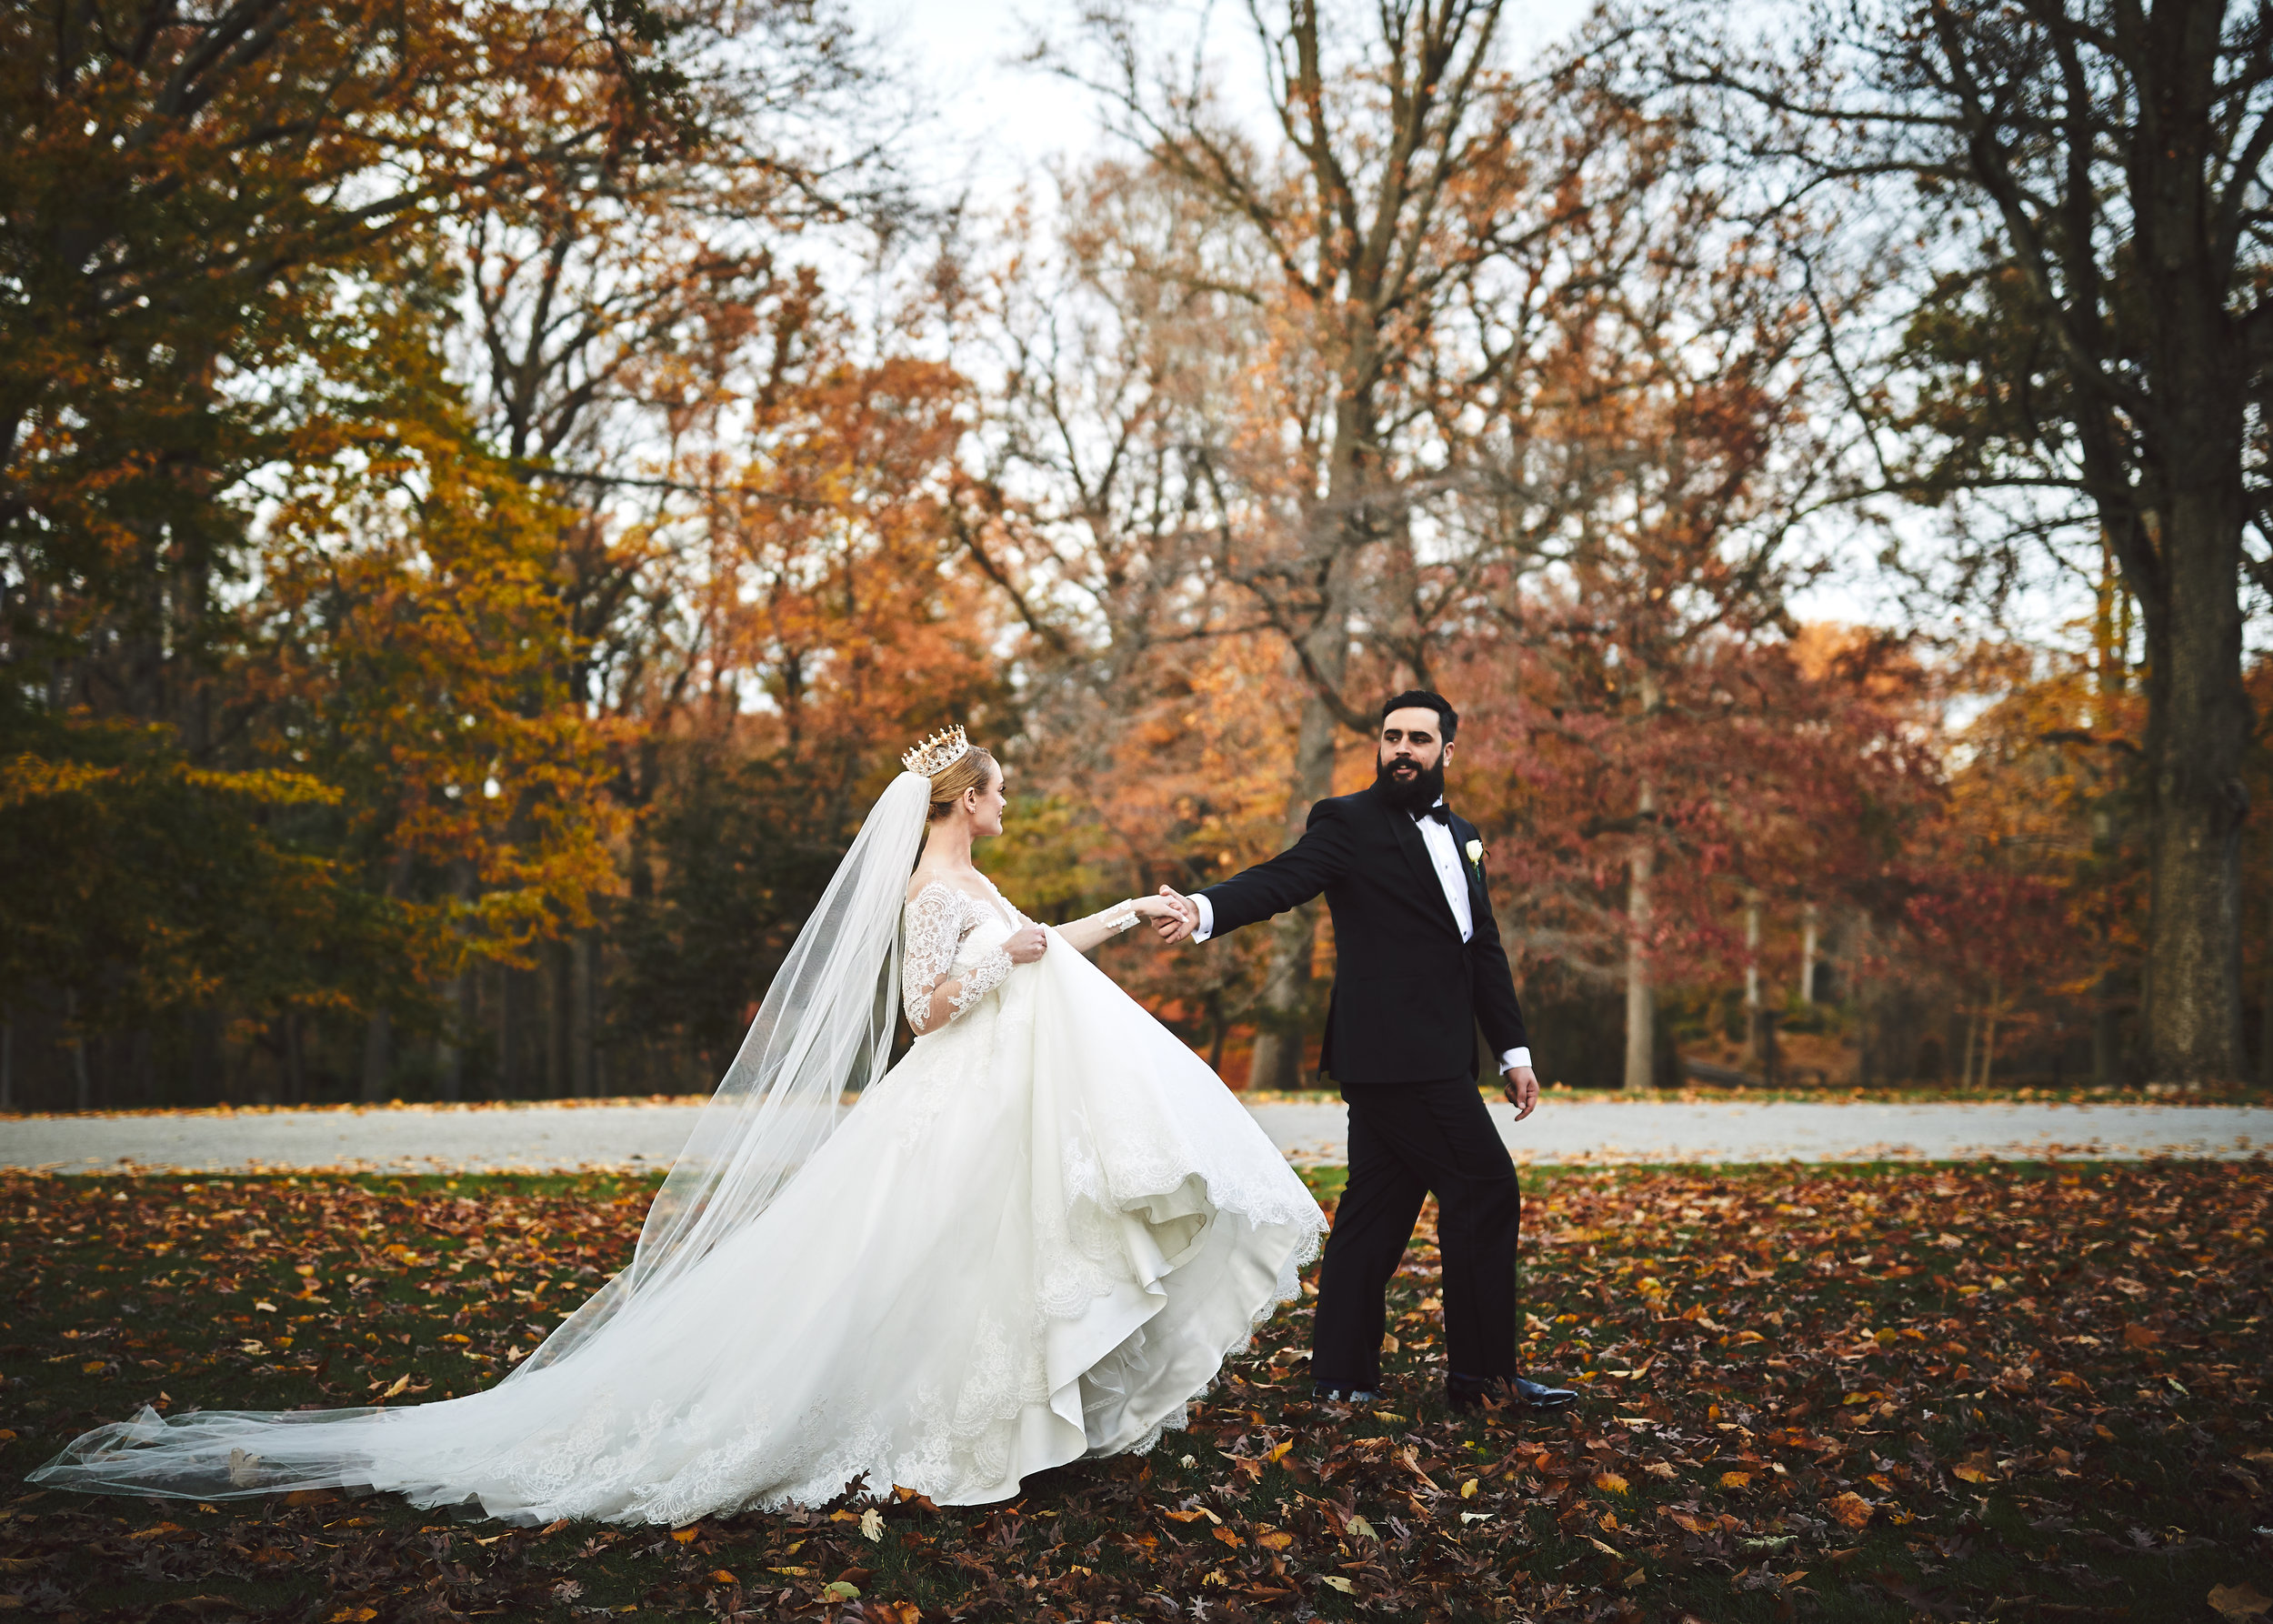 171111_Chris&Quinn_Wedding_0538.jpg